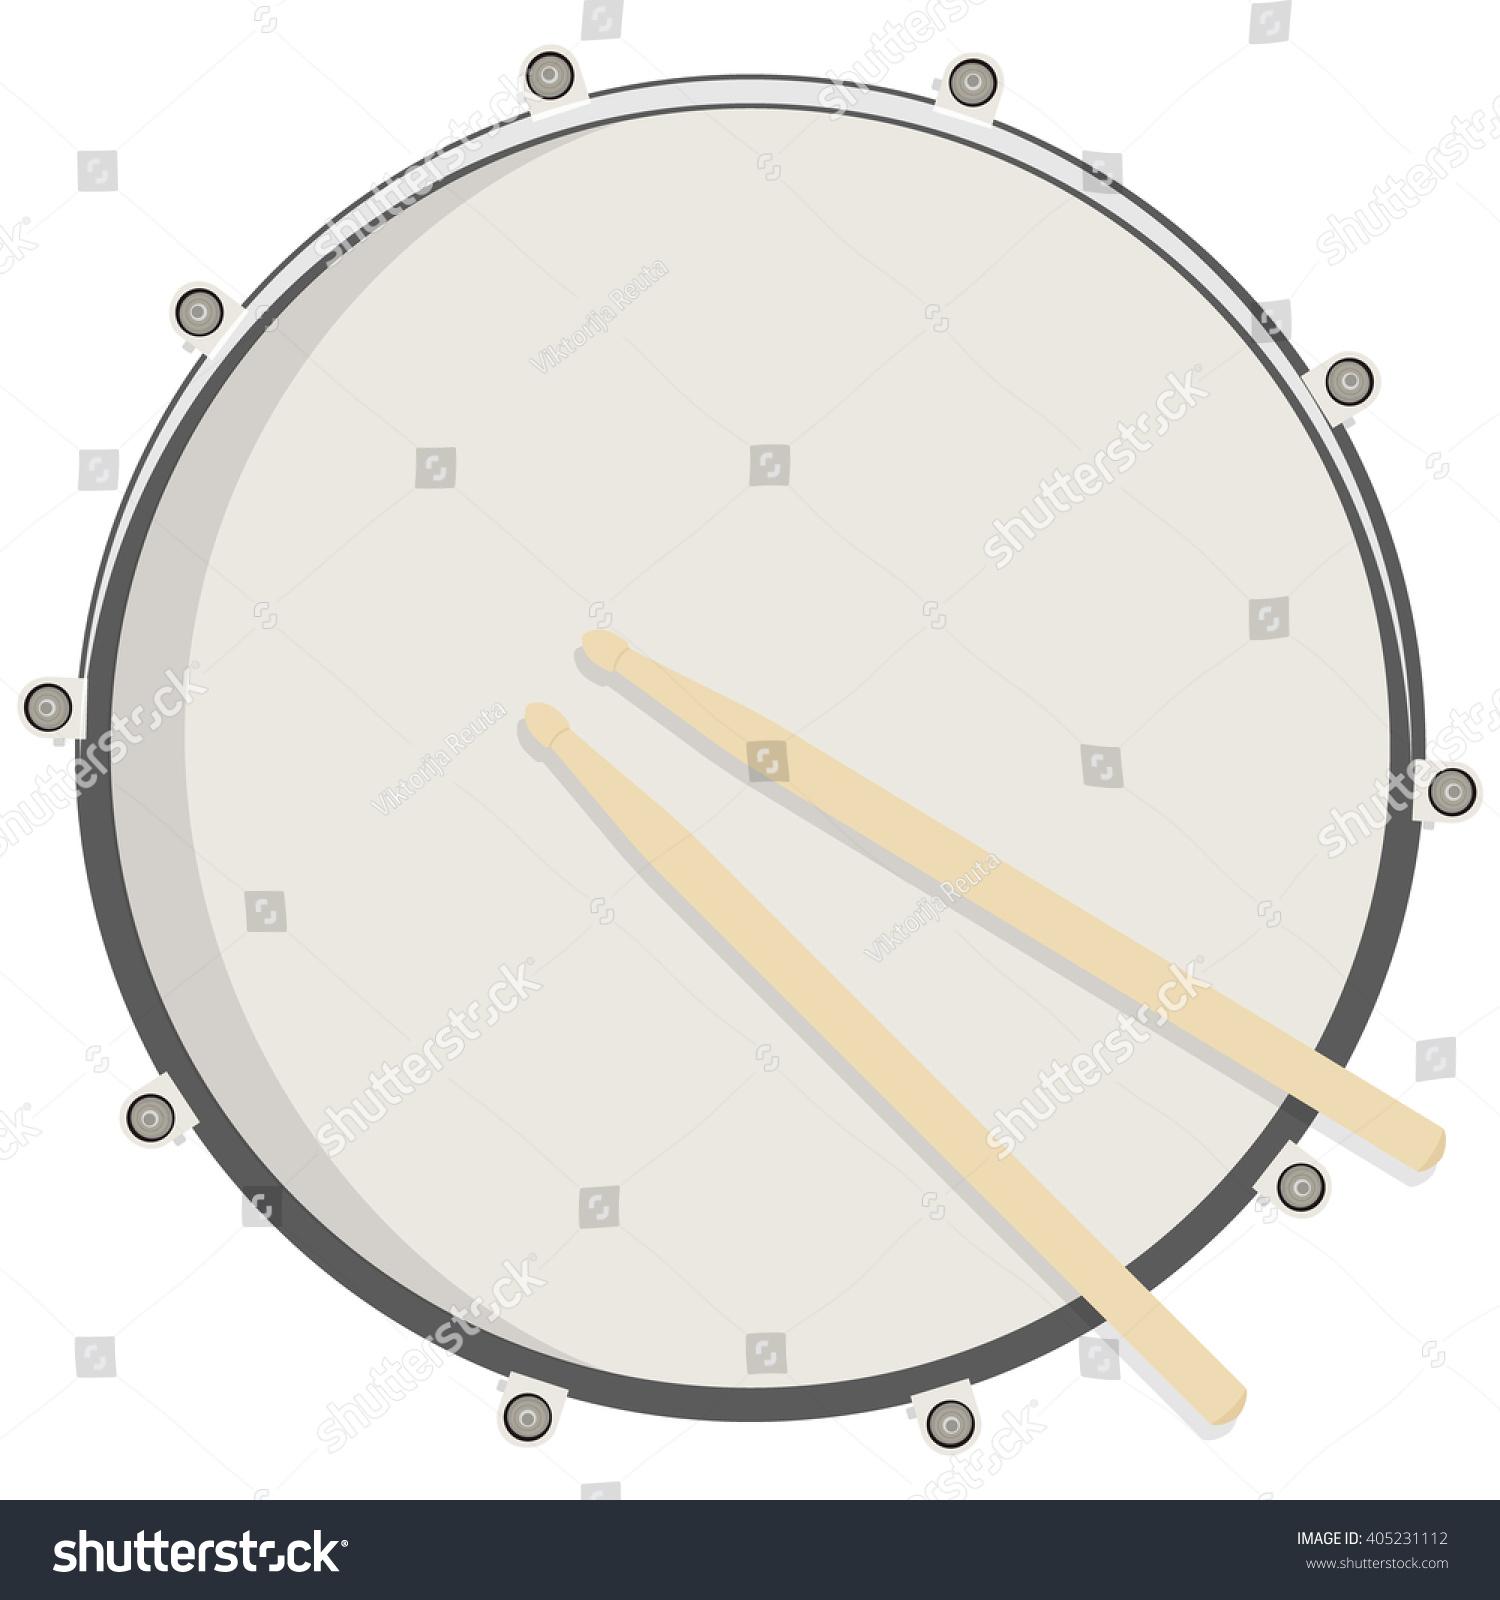 Vector Illustration Drum Sticks Top View Stock Vector ...